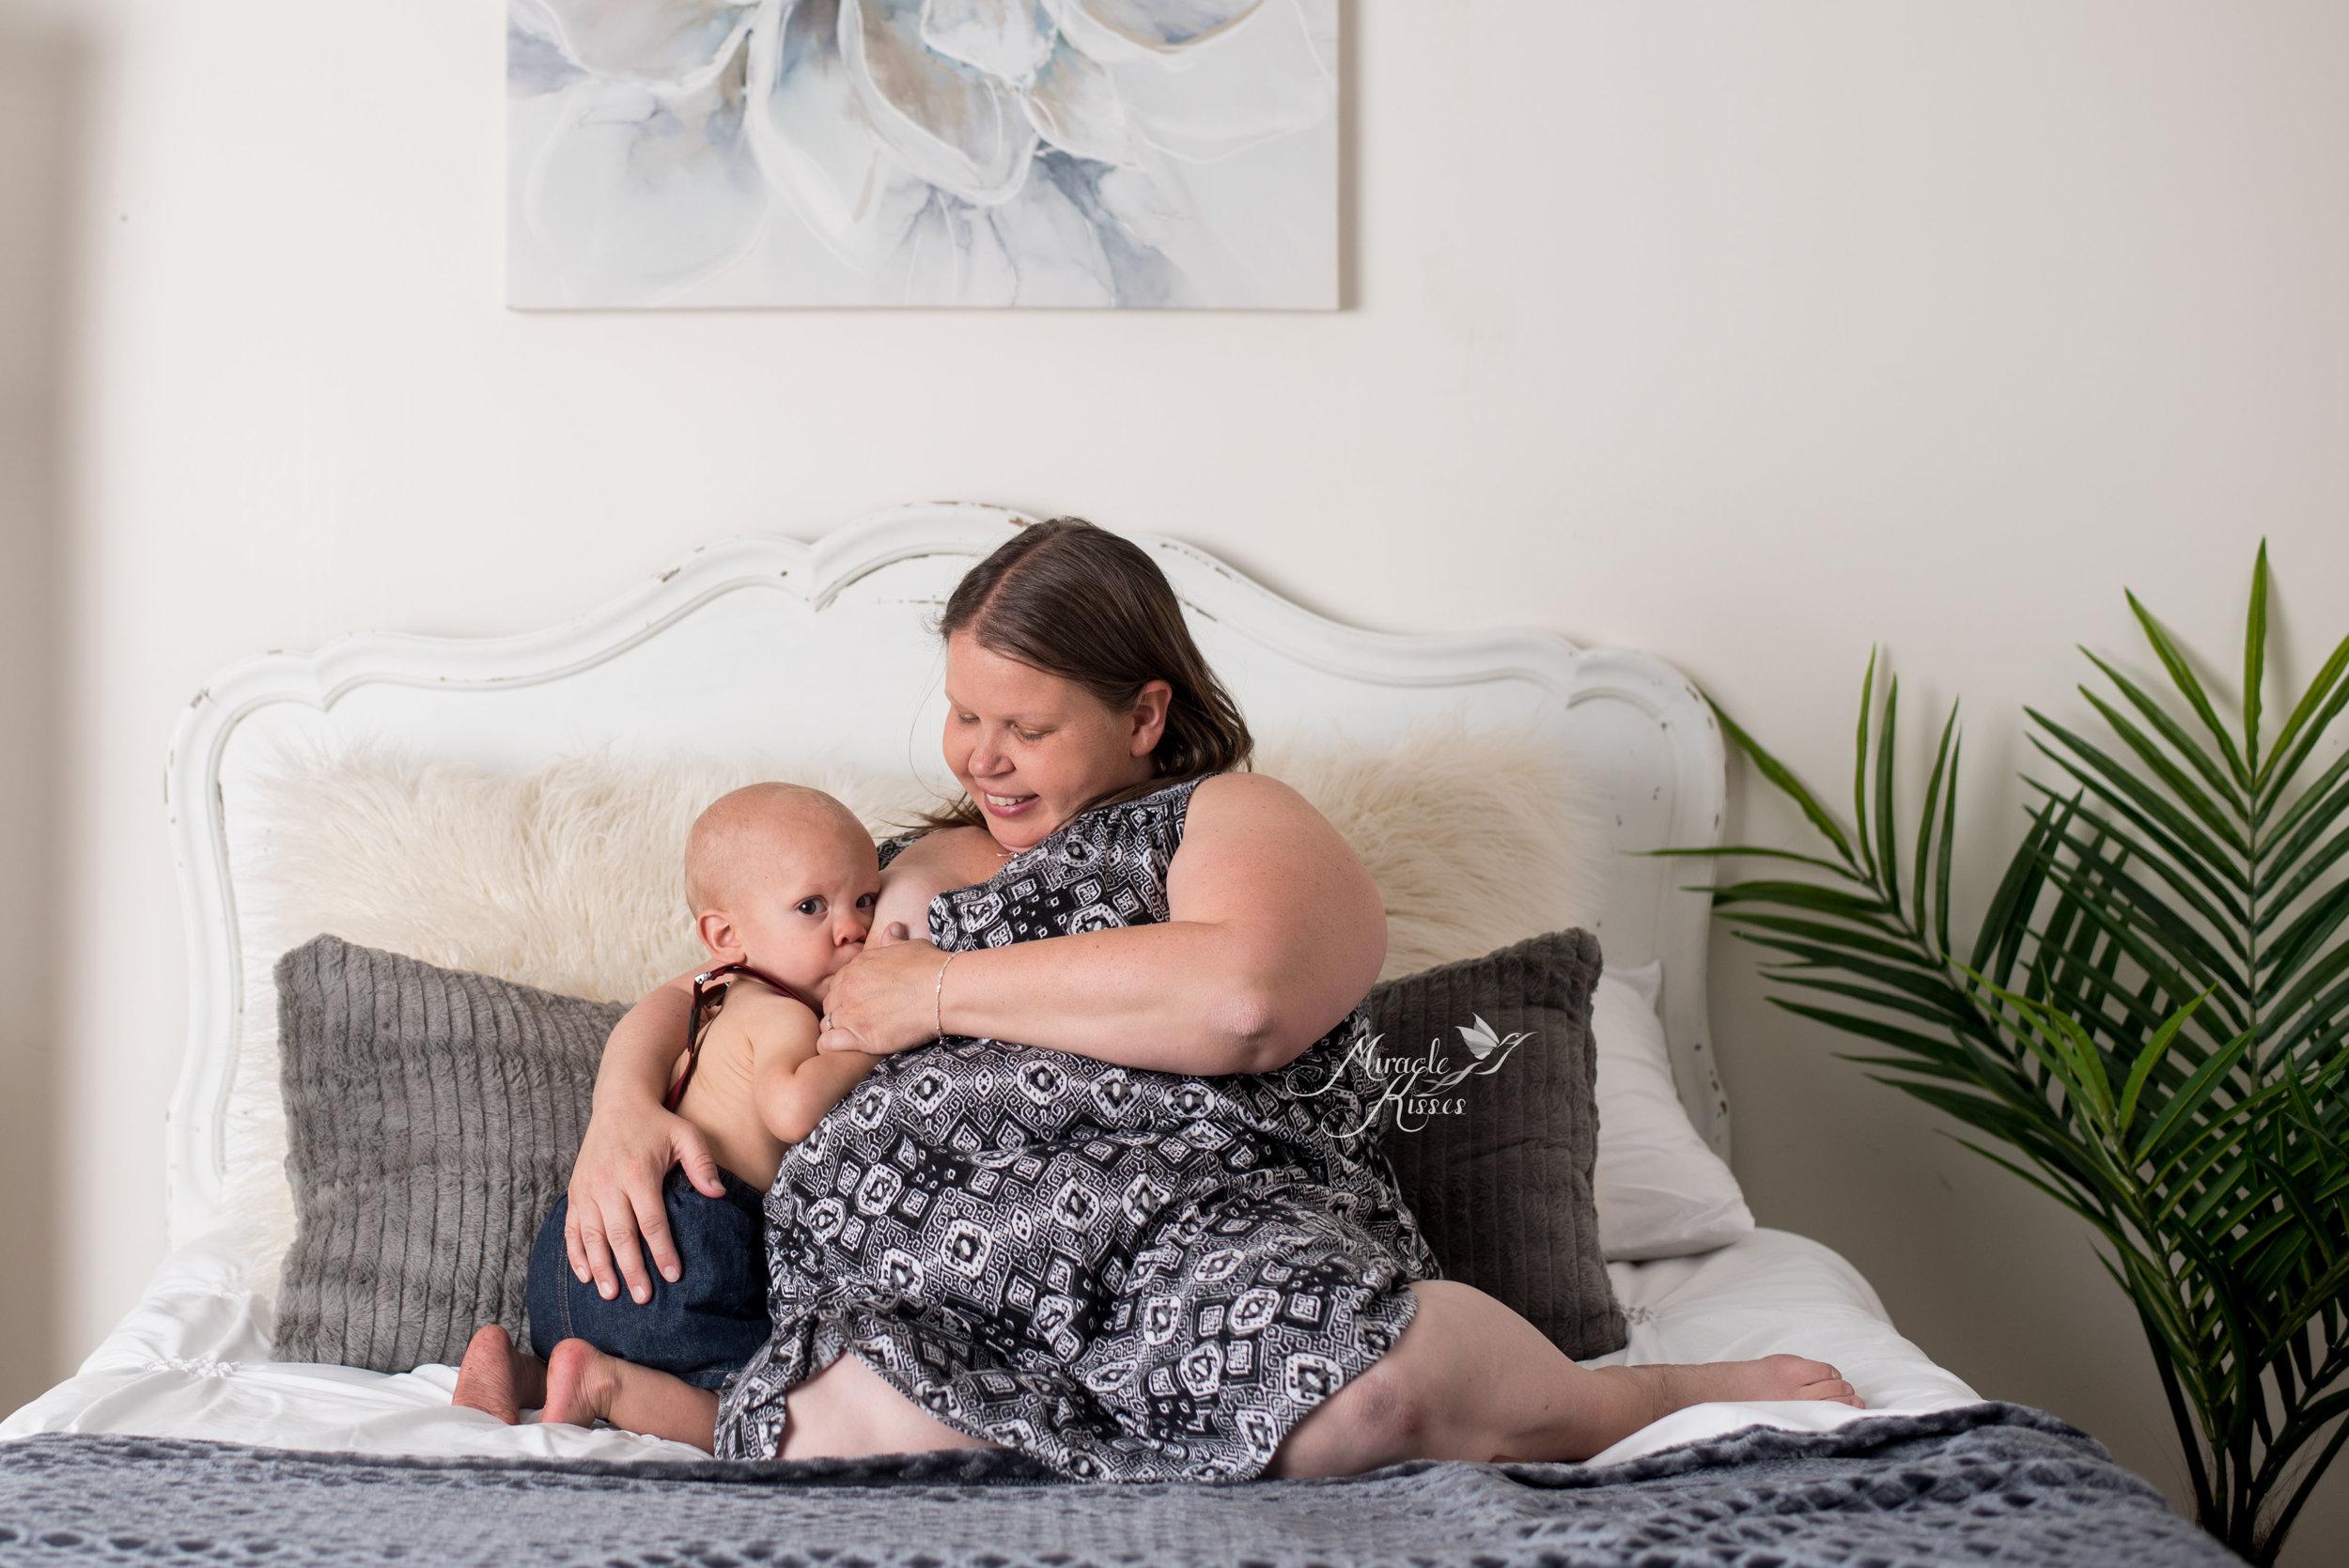 mothers love breastfeeding project, world breastfeeding week